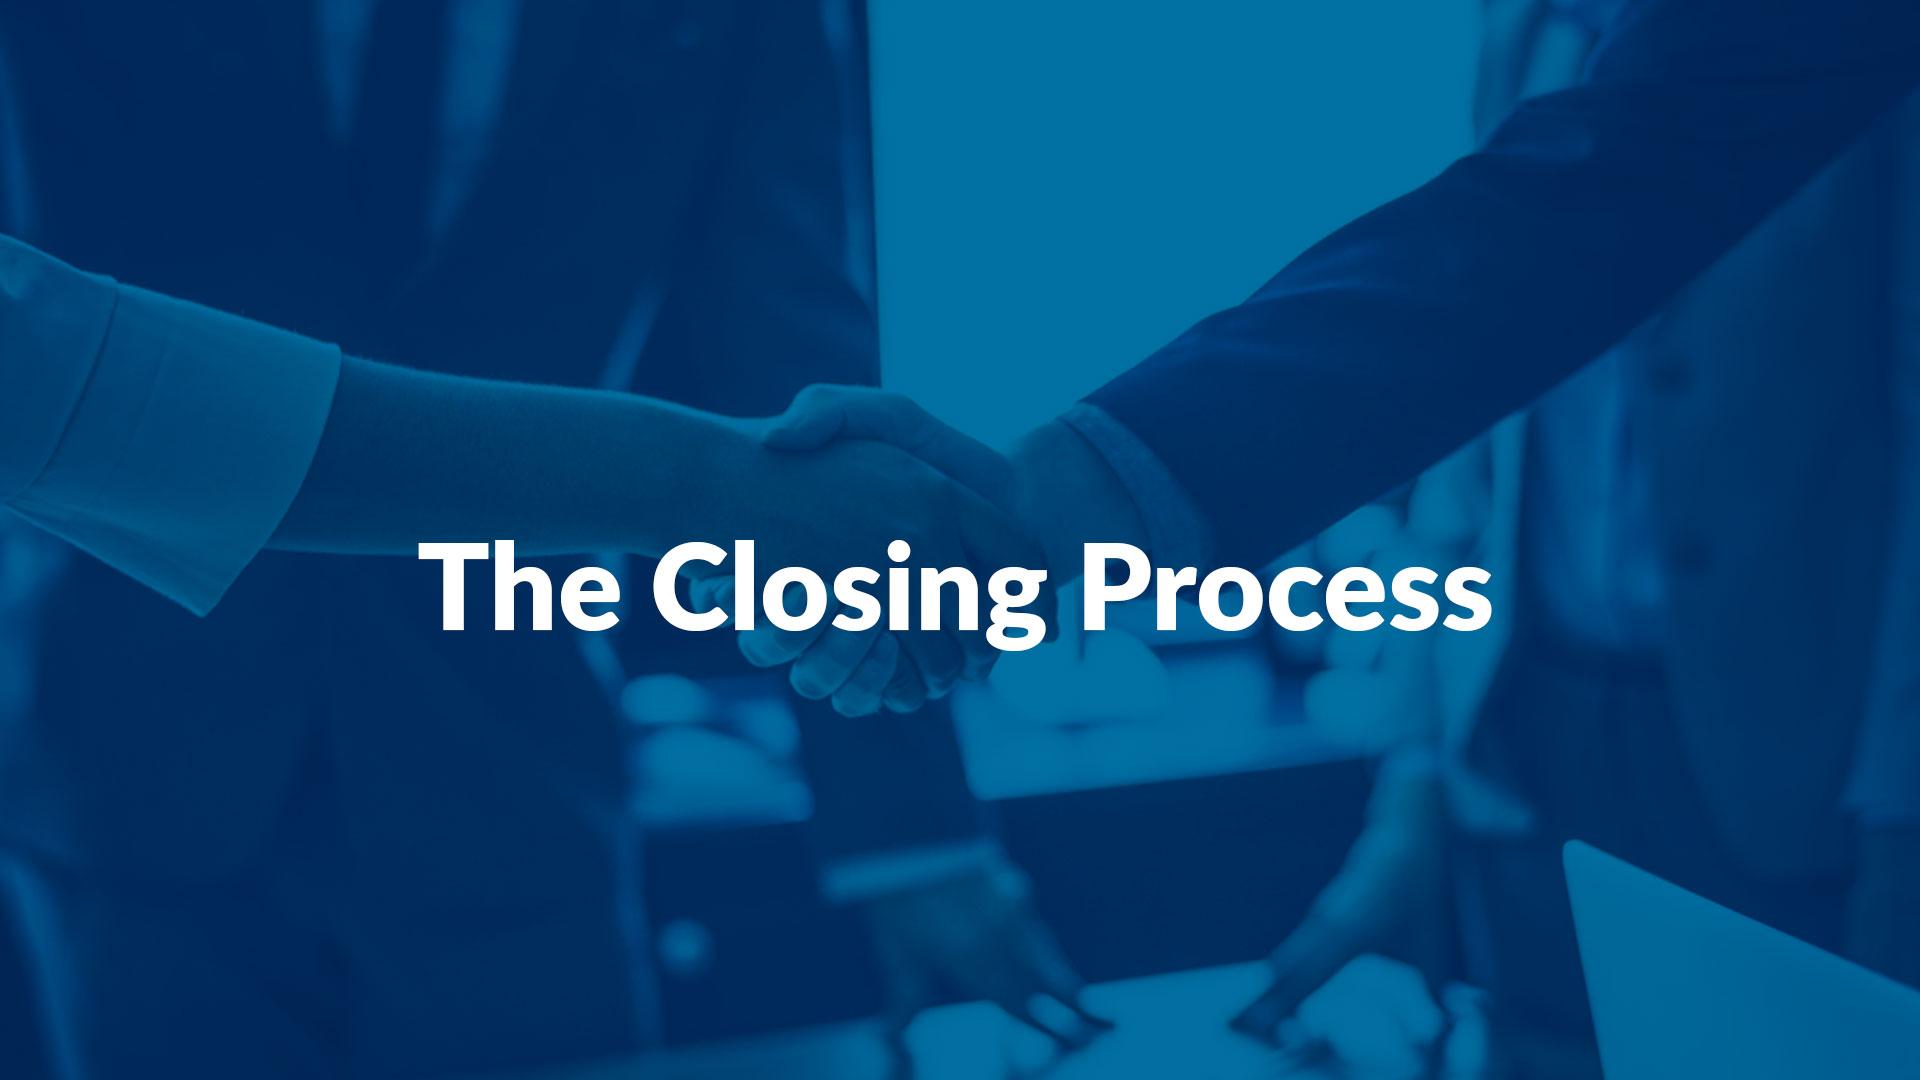 The-Closing-Process—2